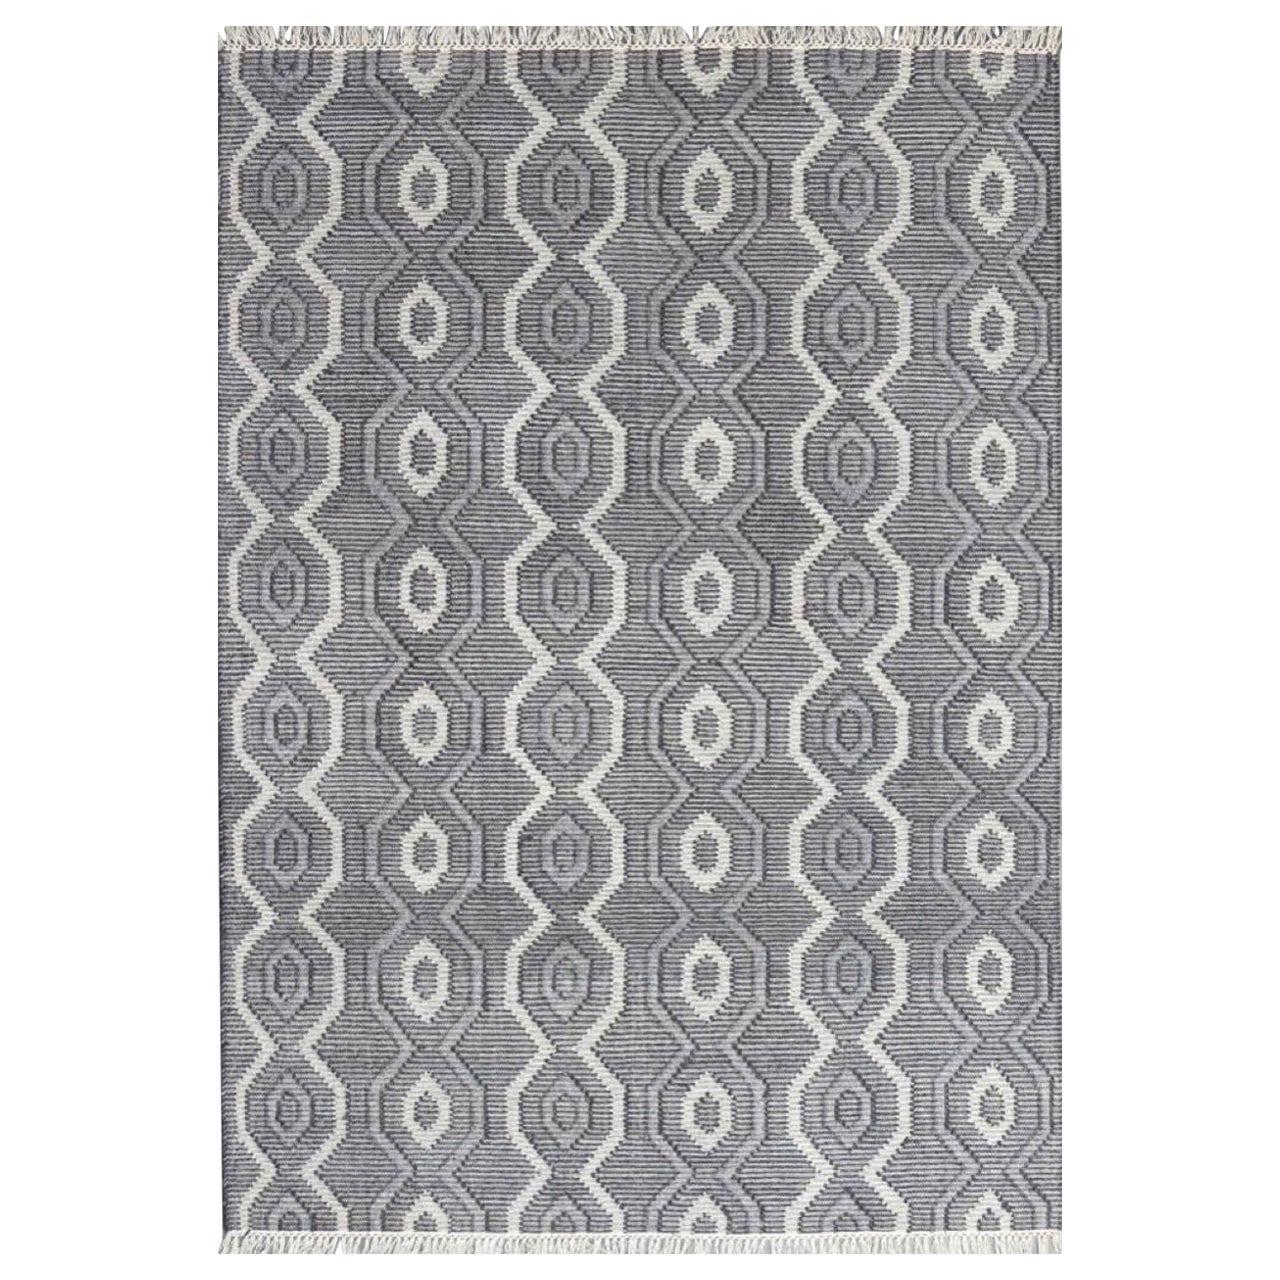 New Scandinavian Design Handwoven Flat Rug Kilim